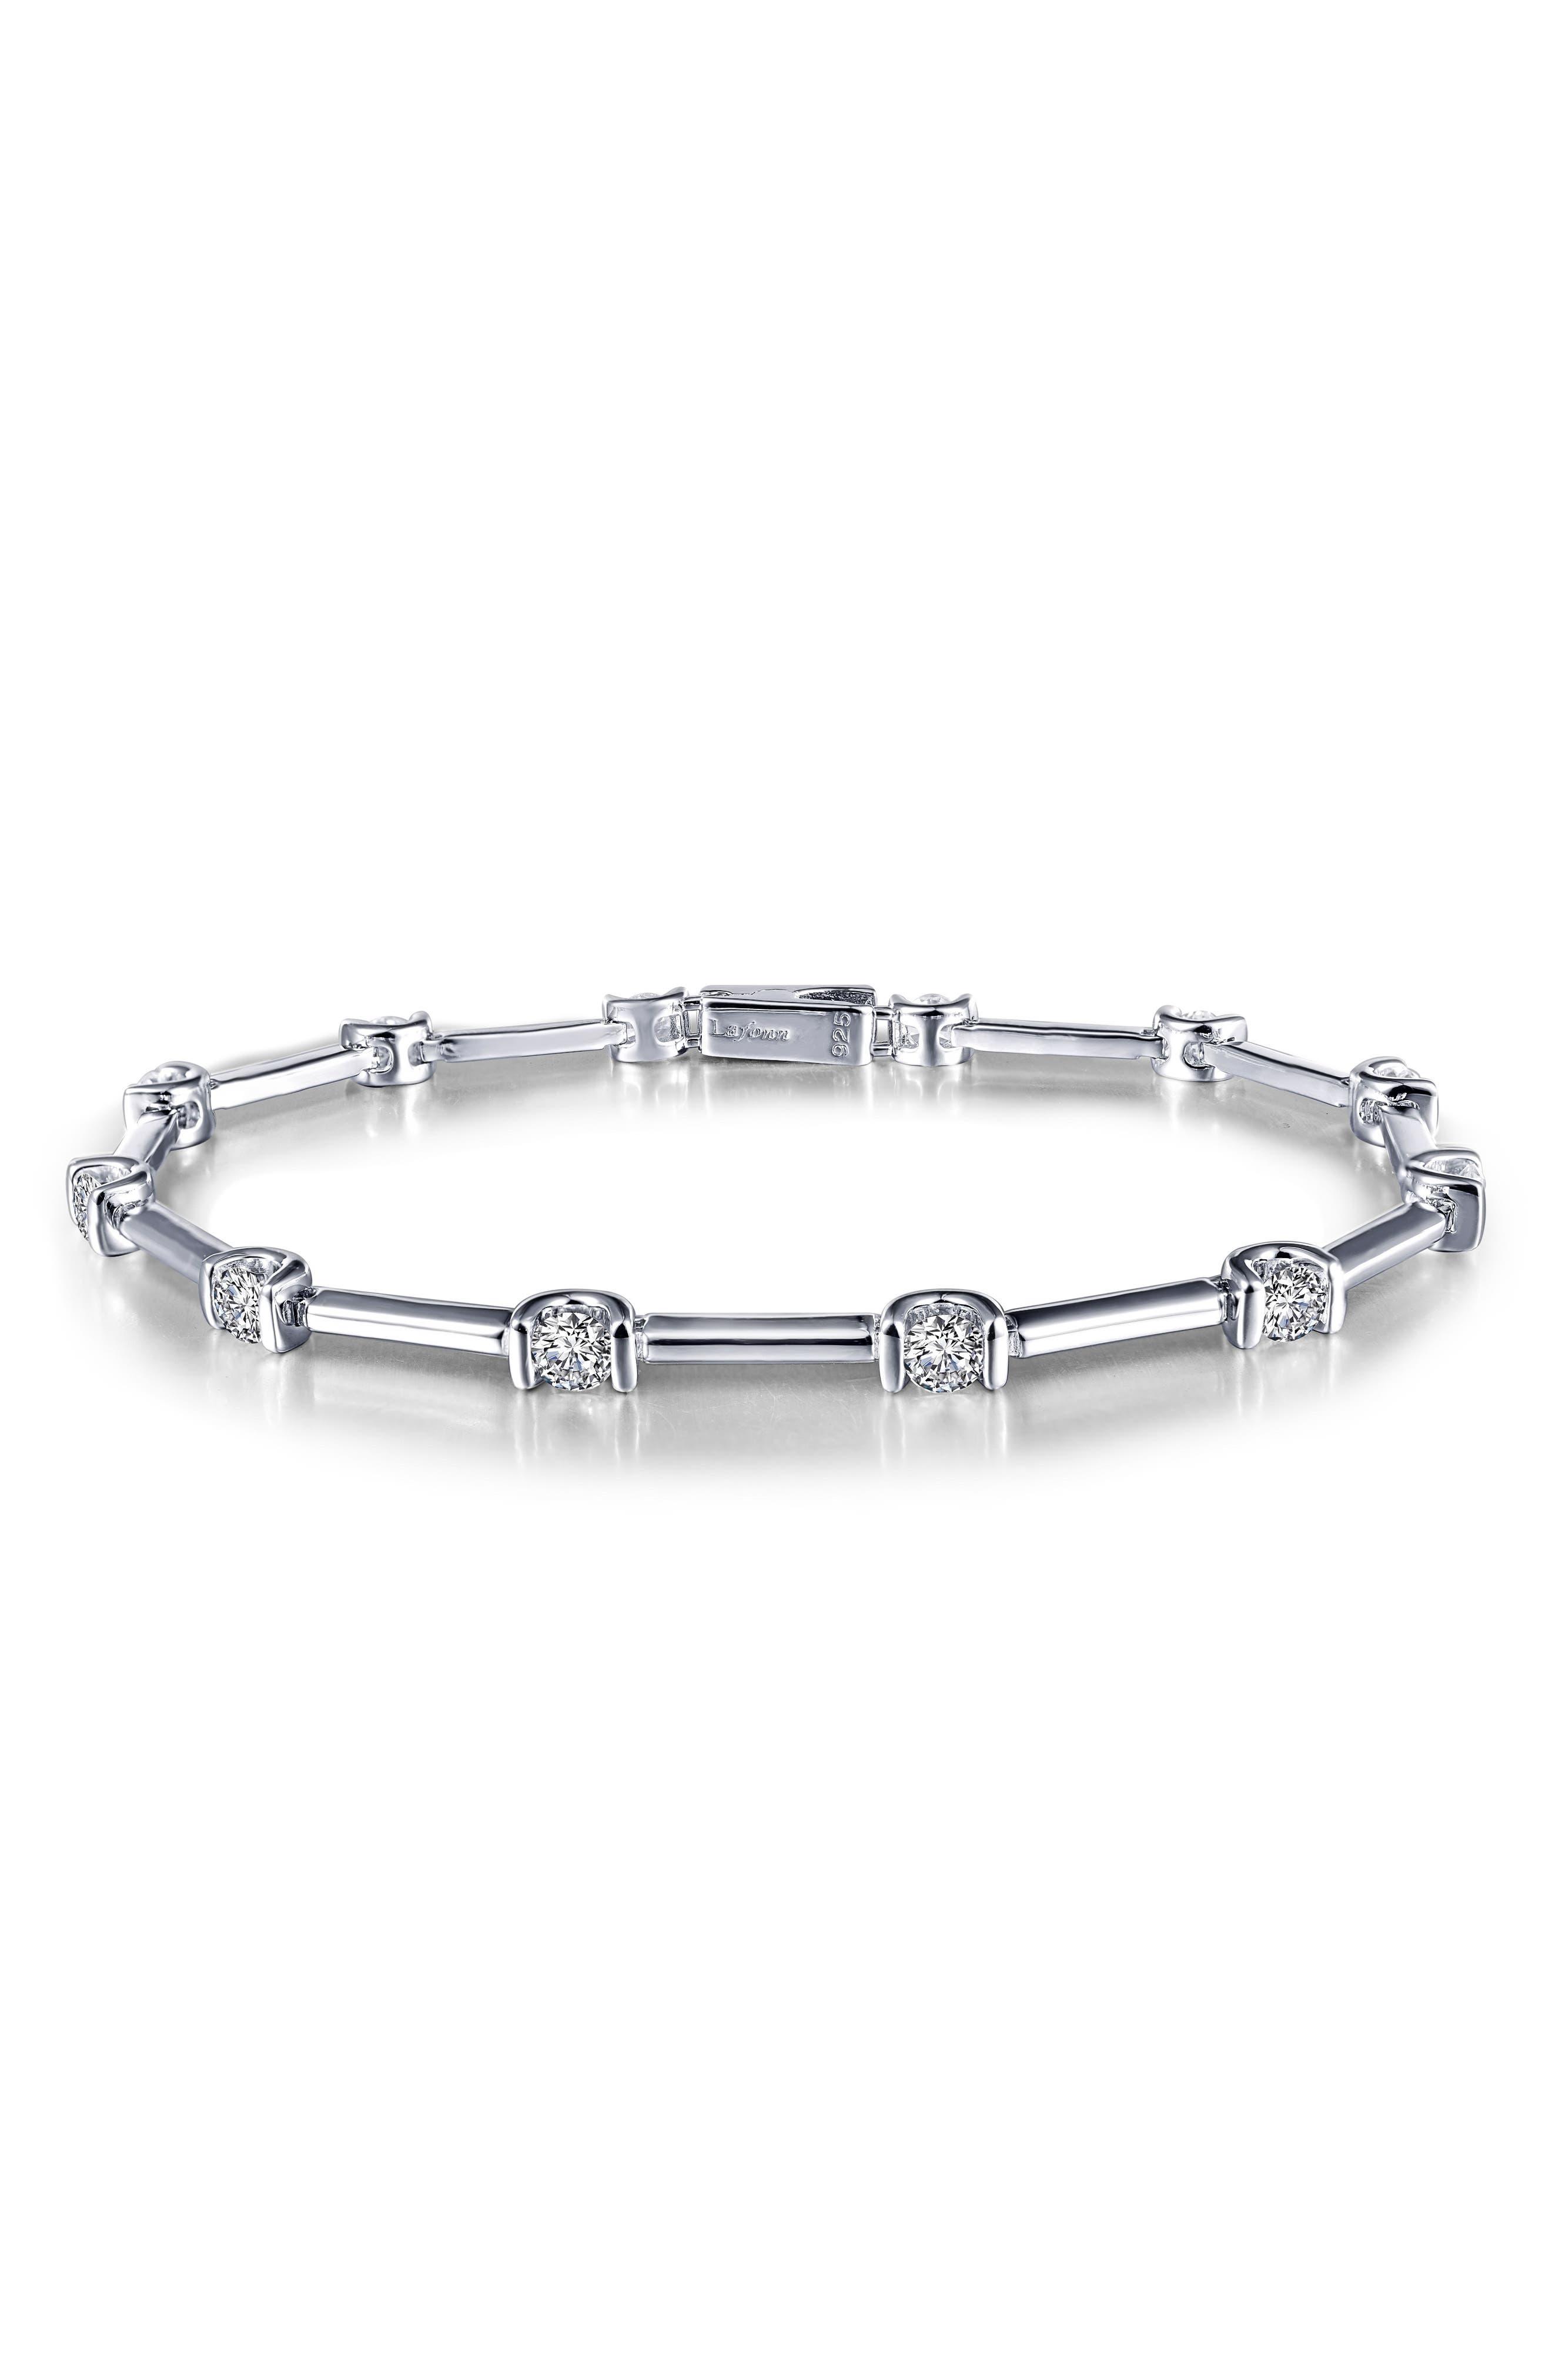 Simulated Diamond Bracelet,                             Alternate thumbnail 2, color,                             Silver/ Clear